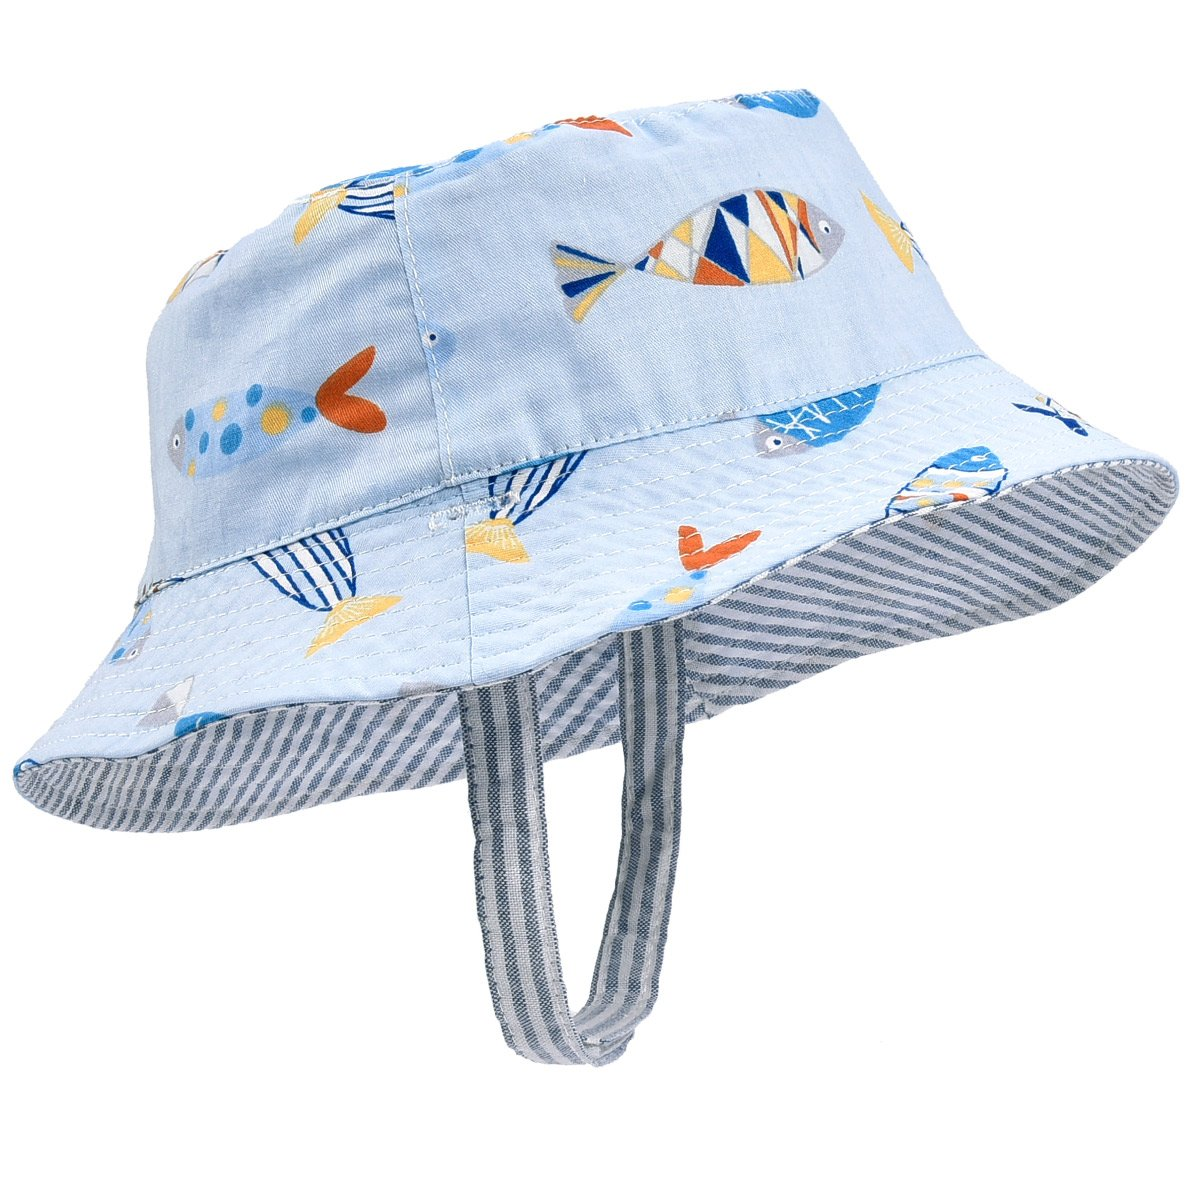 Toddler Kids Summer Sun Hat Boys Girls Reversible Cotton Bucket Hat Spring Hat for 6M-4T